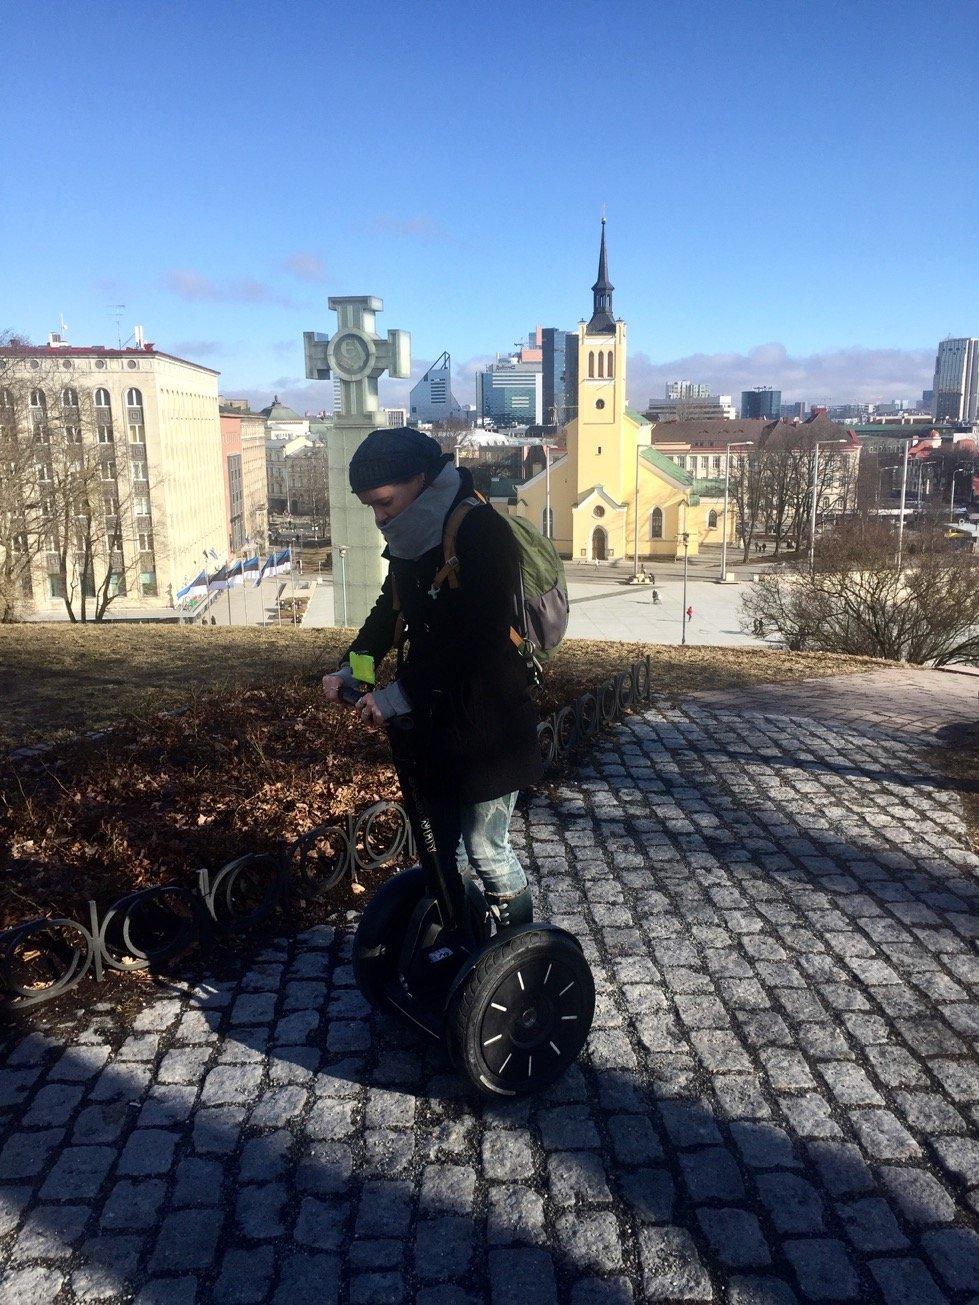 Sarah's standing on a segway in Tallinn